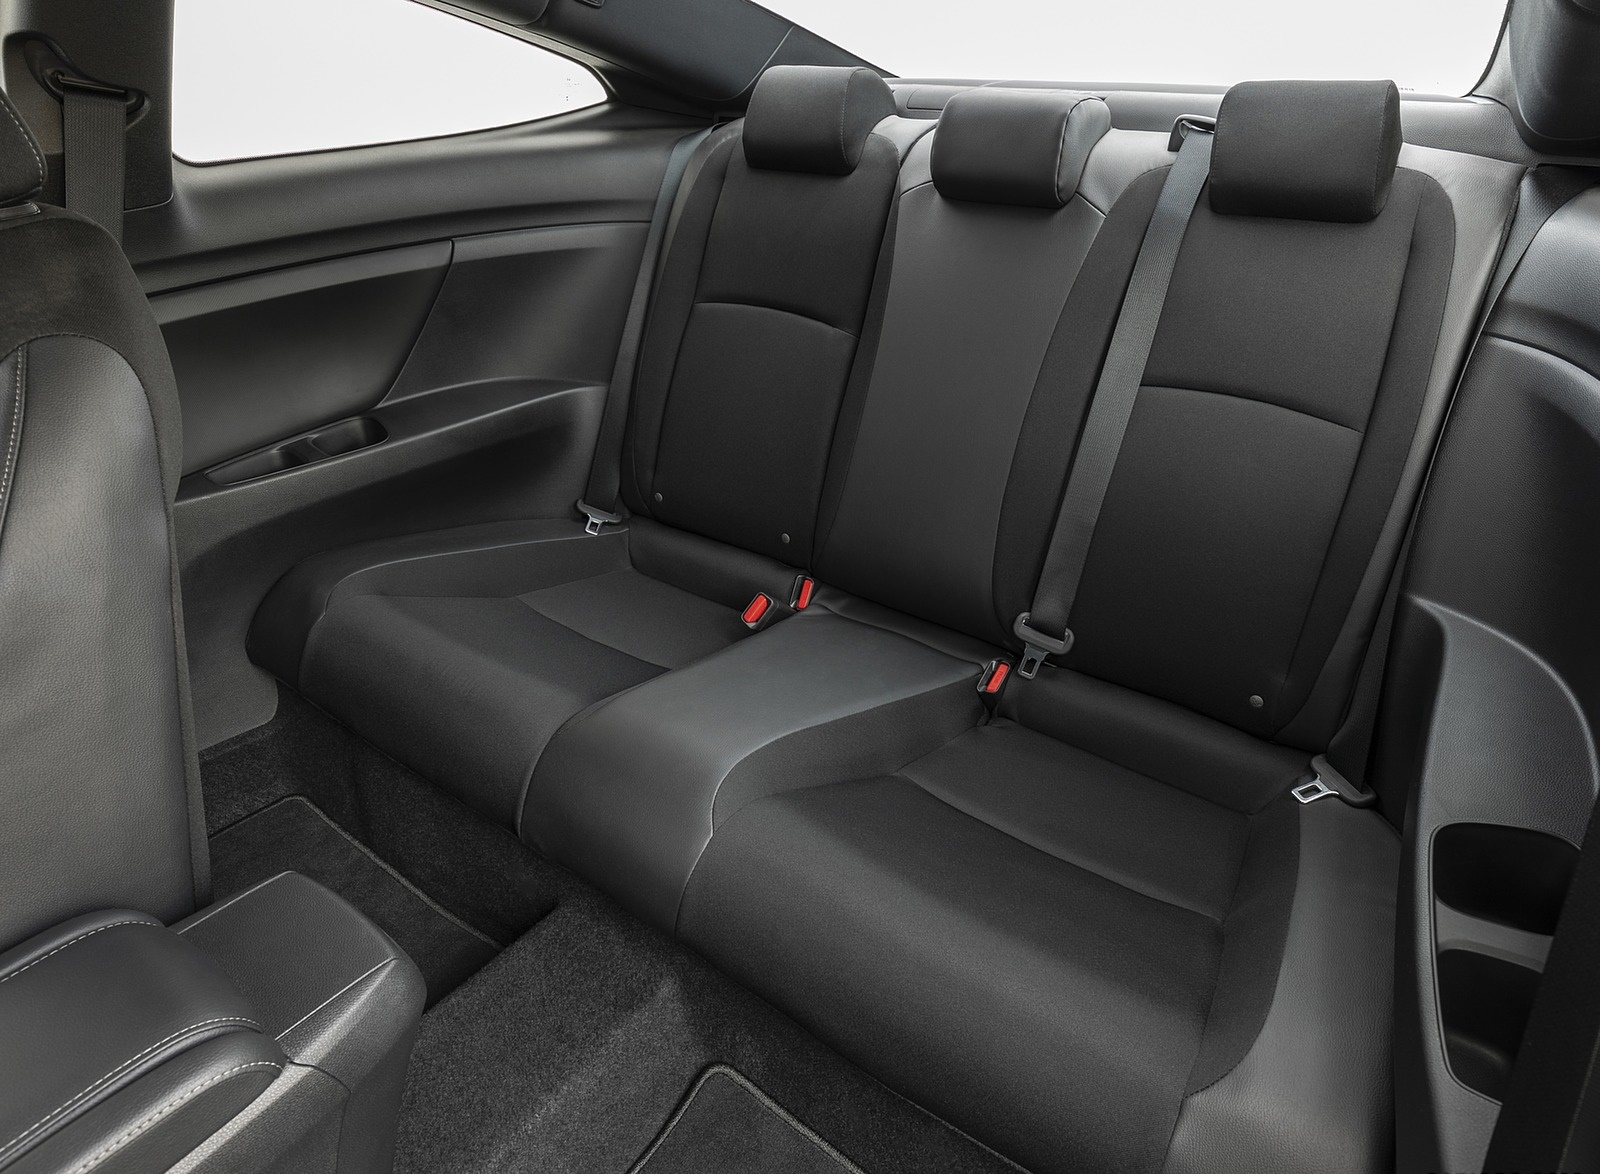 2020 Honda Civic Coupe Sport Interior Rear Seats Wallpapers 63 Newcarcars